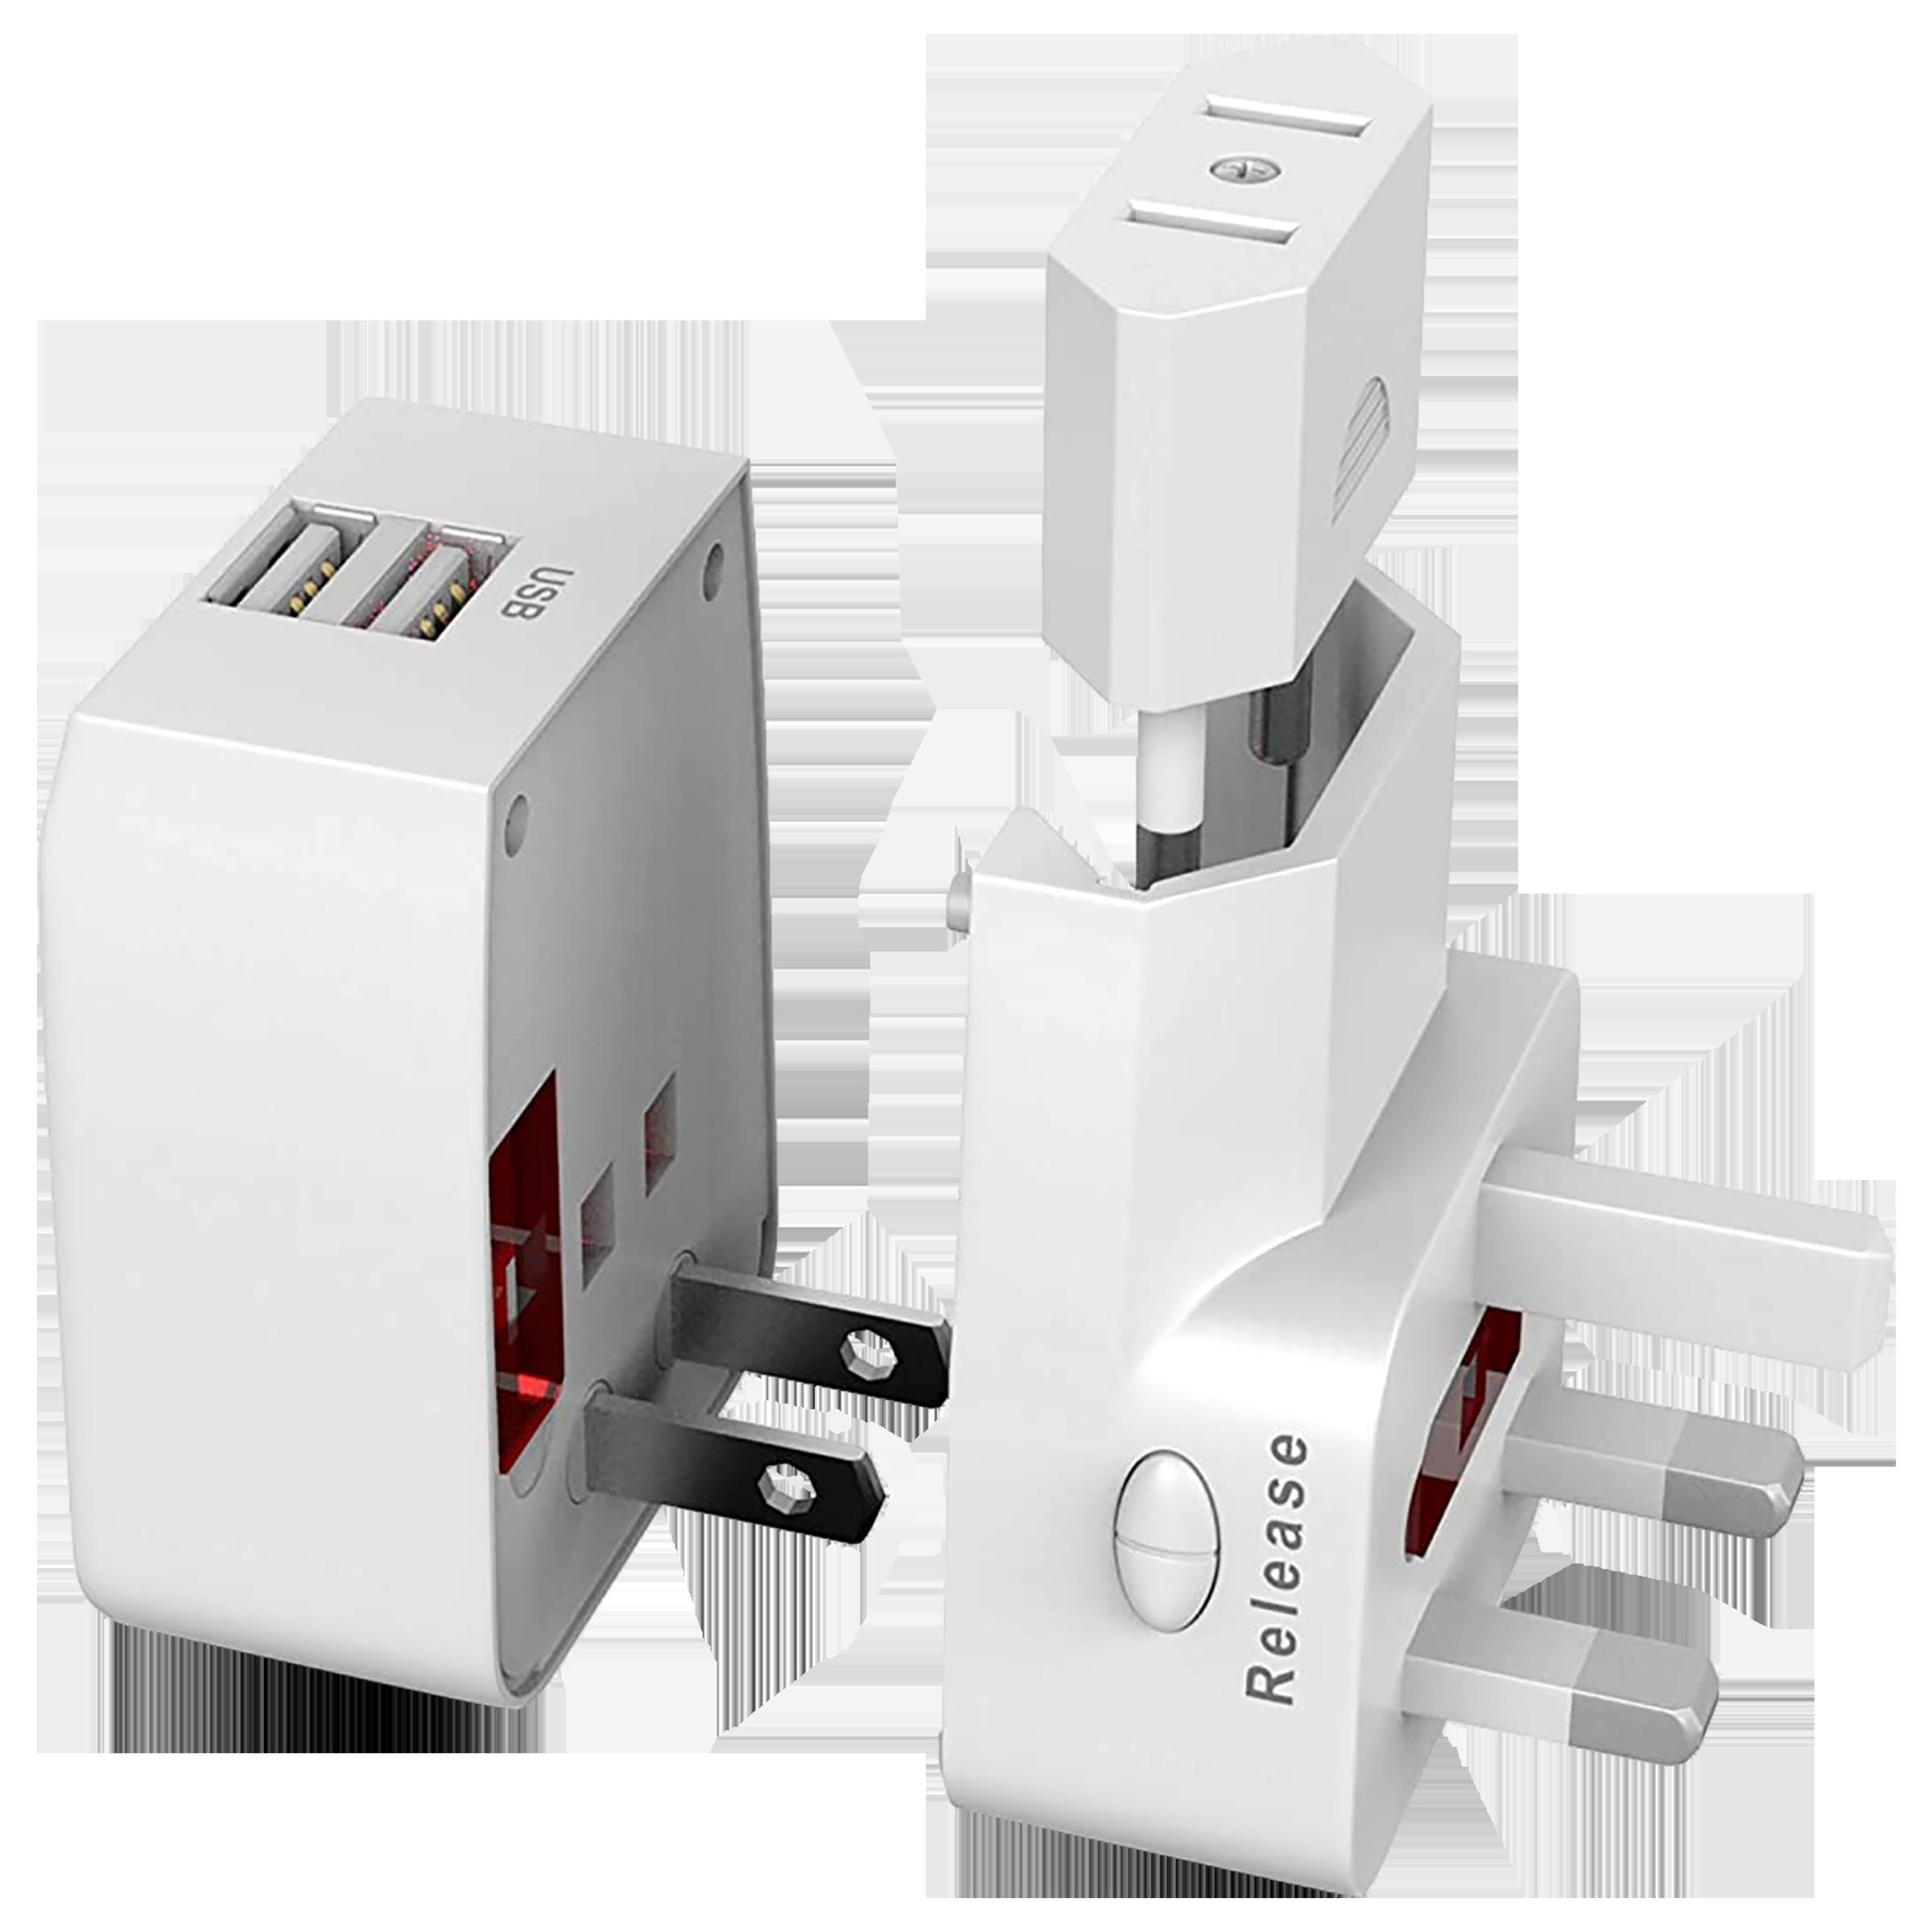 Trovo Plug Pack Lite 3 Plugs Adapter (Dual USB Ports, TTA-11, White)_4